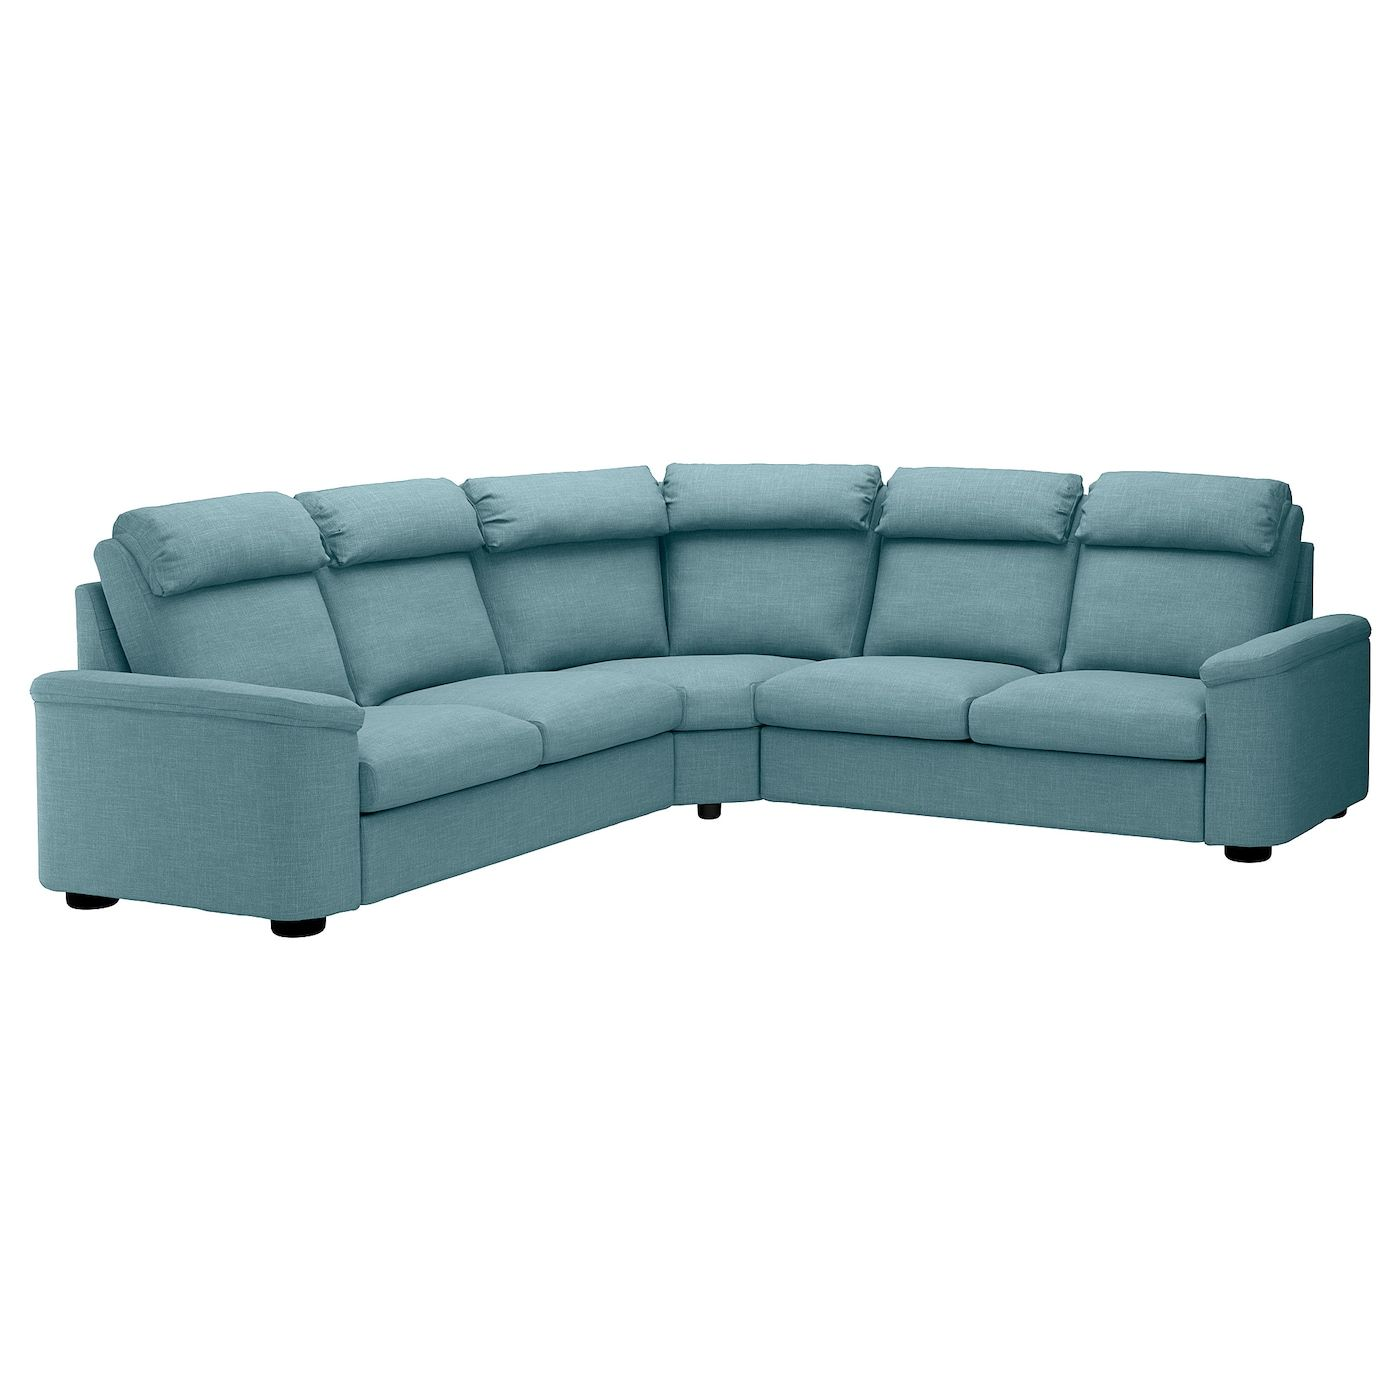 Lidhult Corner Sleeper Sofa 5 Seat Gassebol Bluegray In